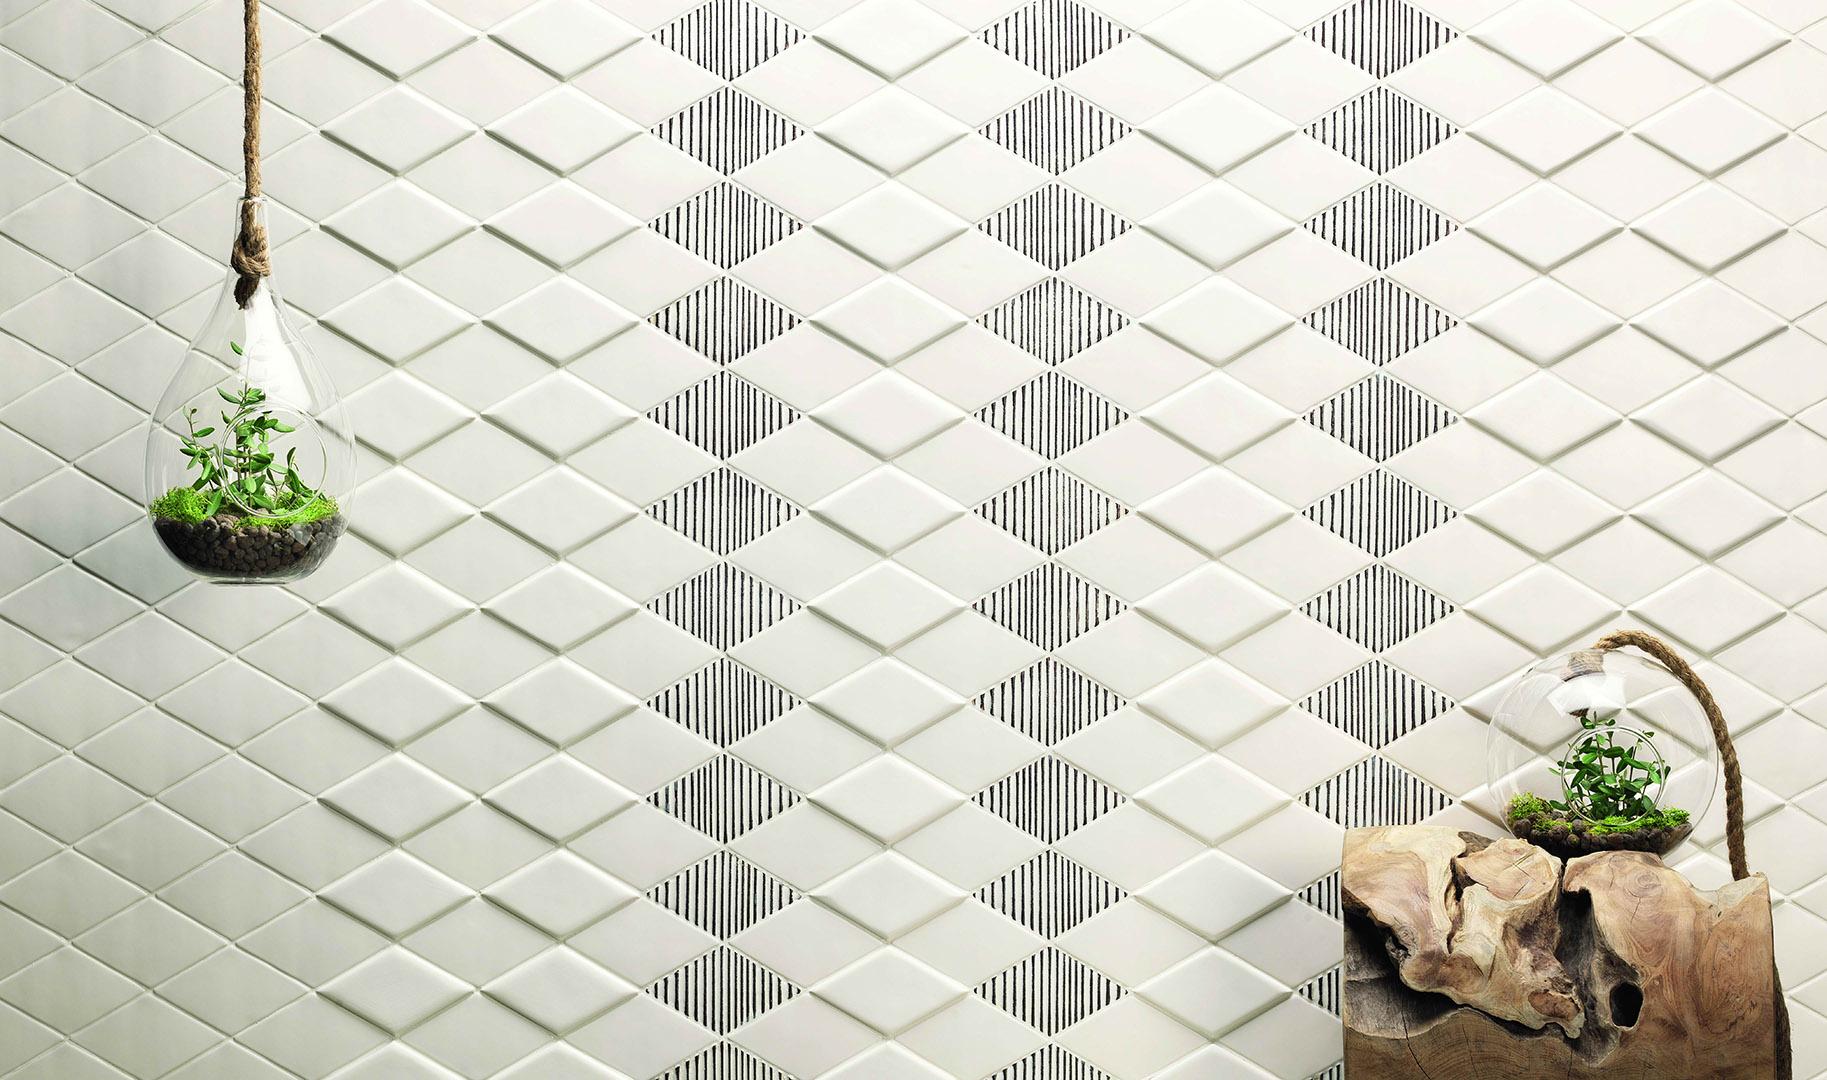 New tile plastic pipe fittings